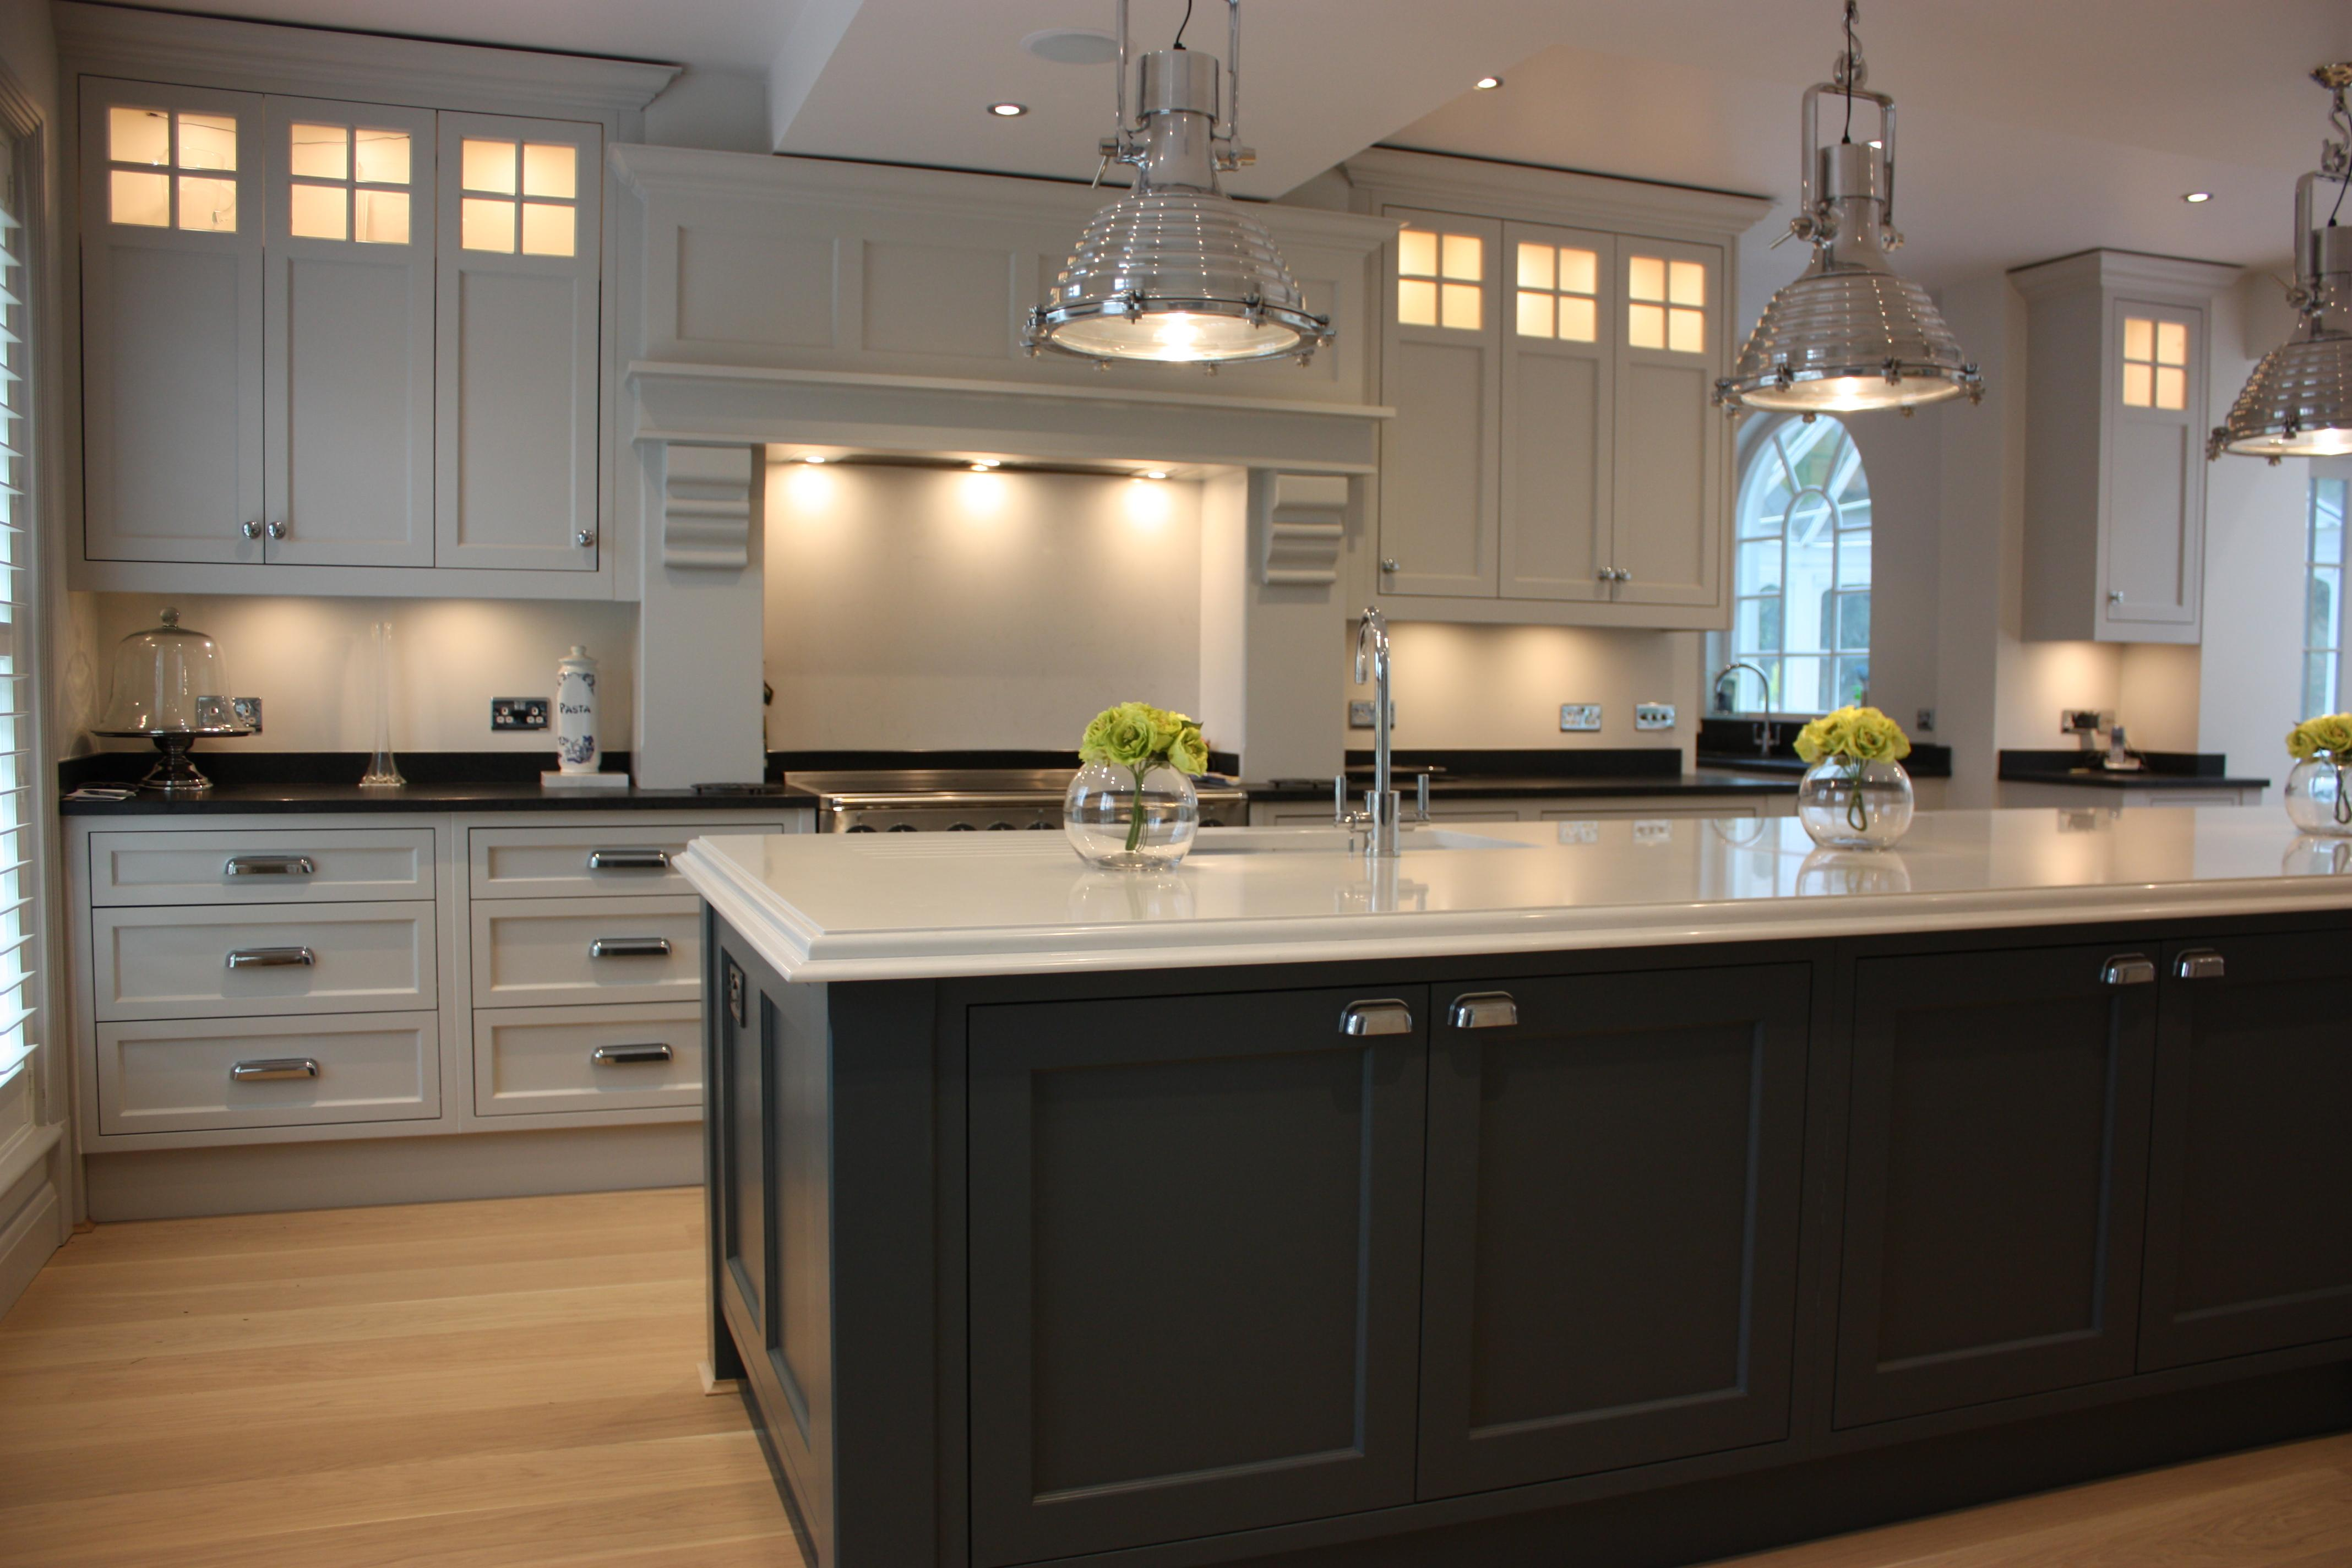 C1e238 Magnificent kitchens